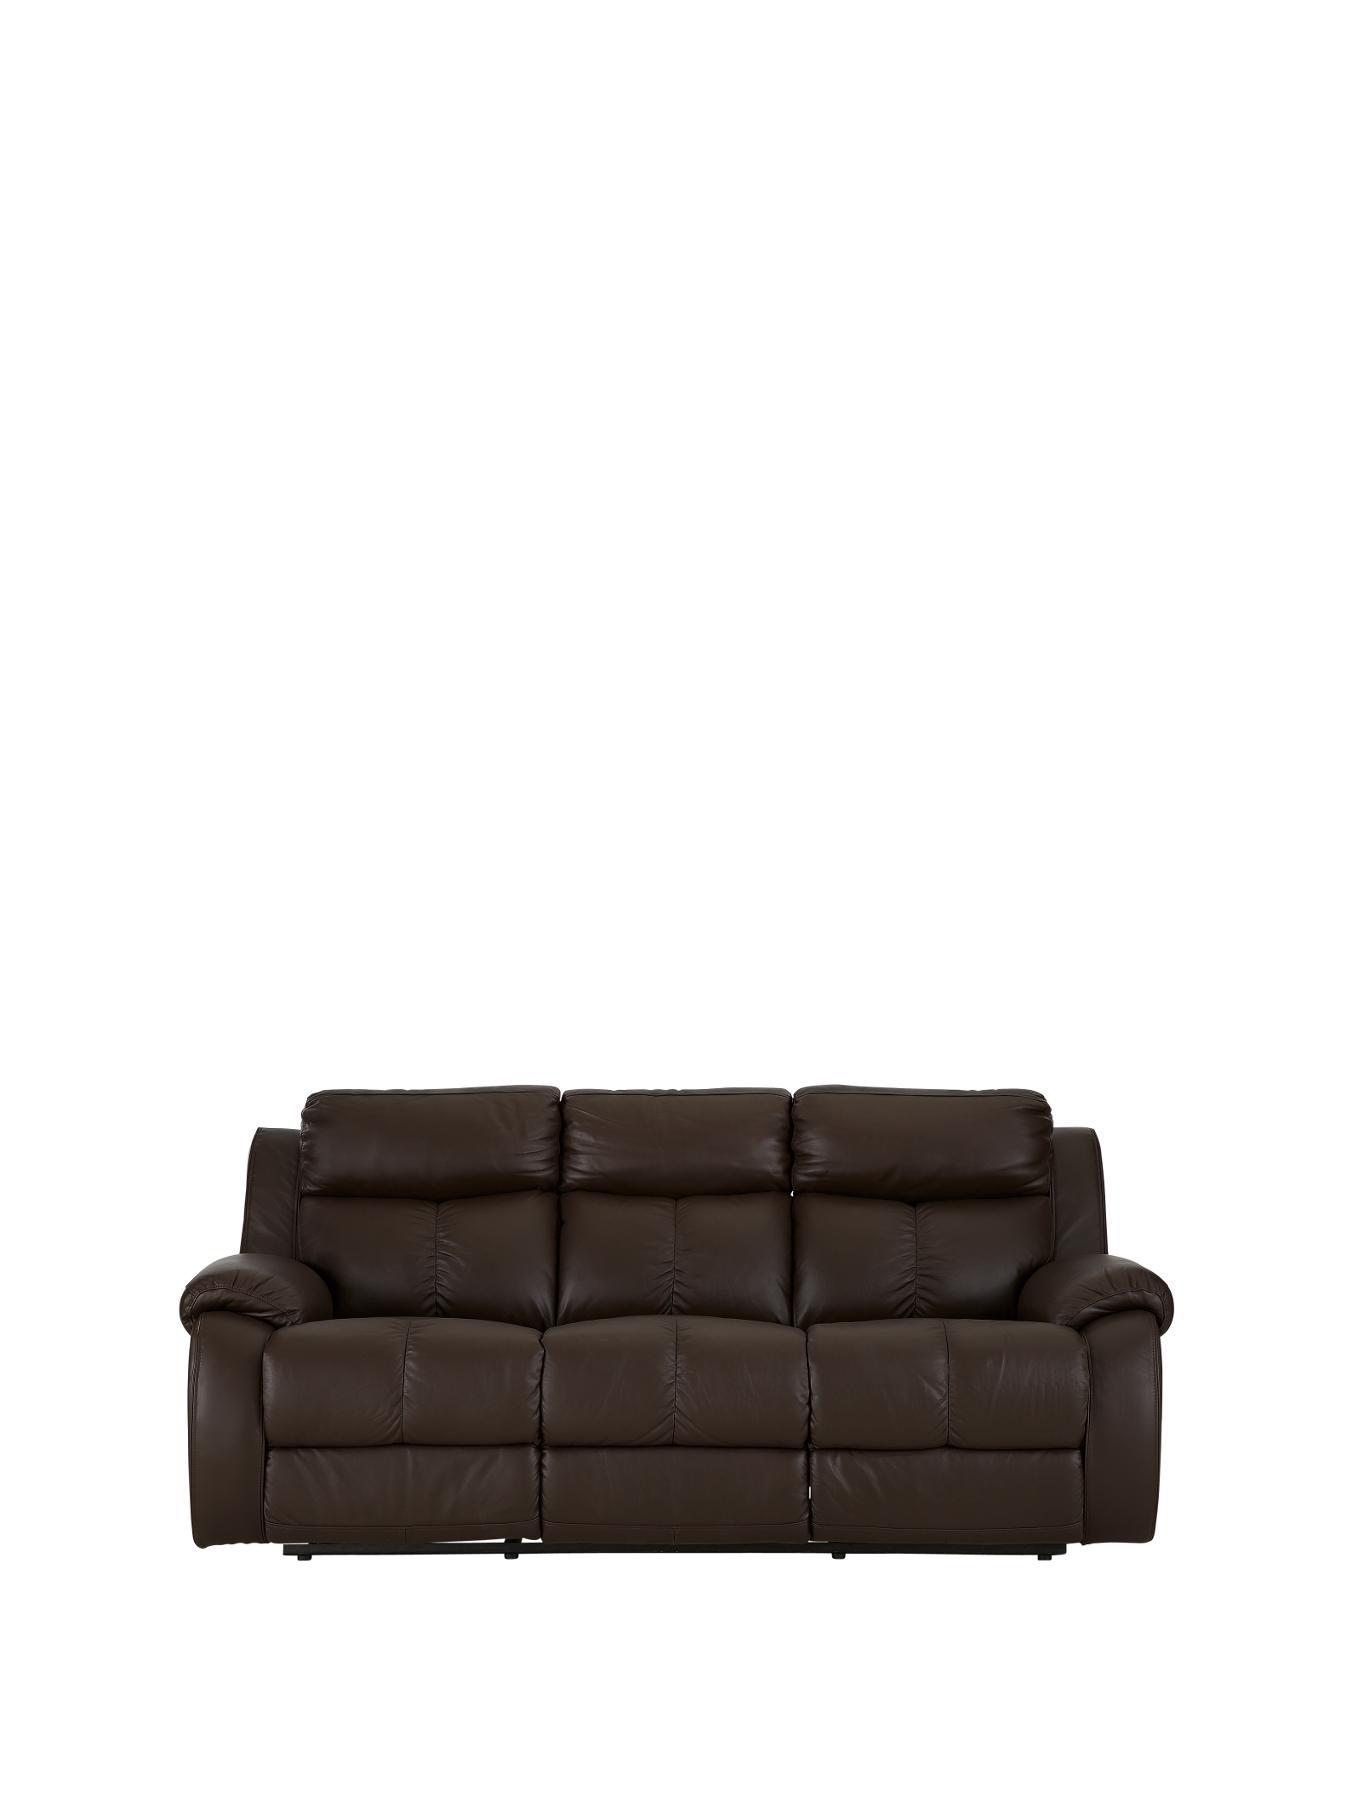 3 seater recliner sofa sale designs wooden littlewoods carlo black